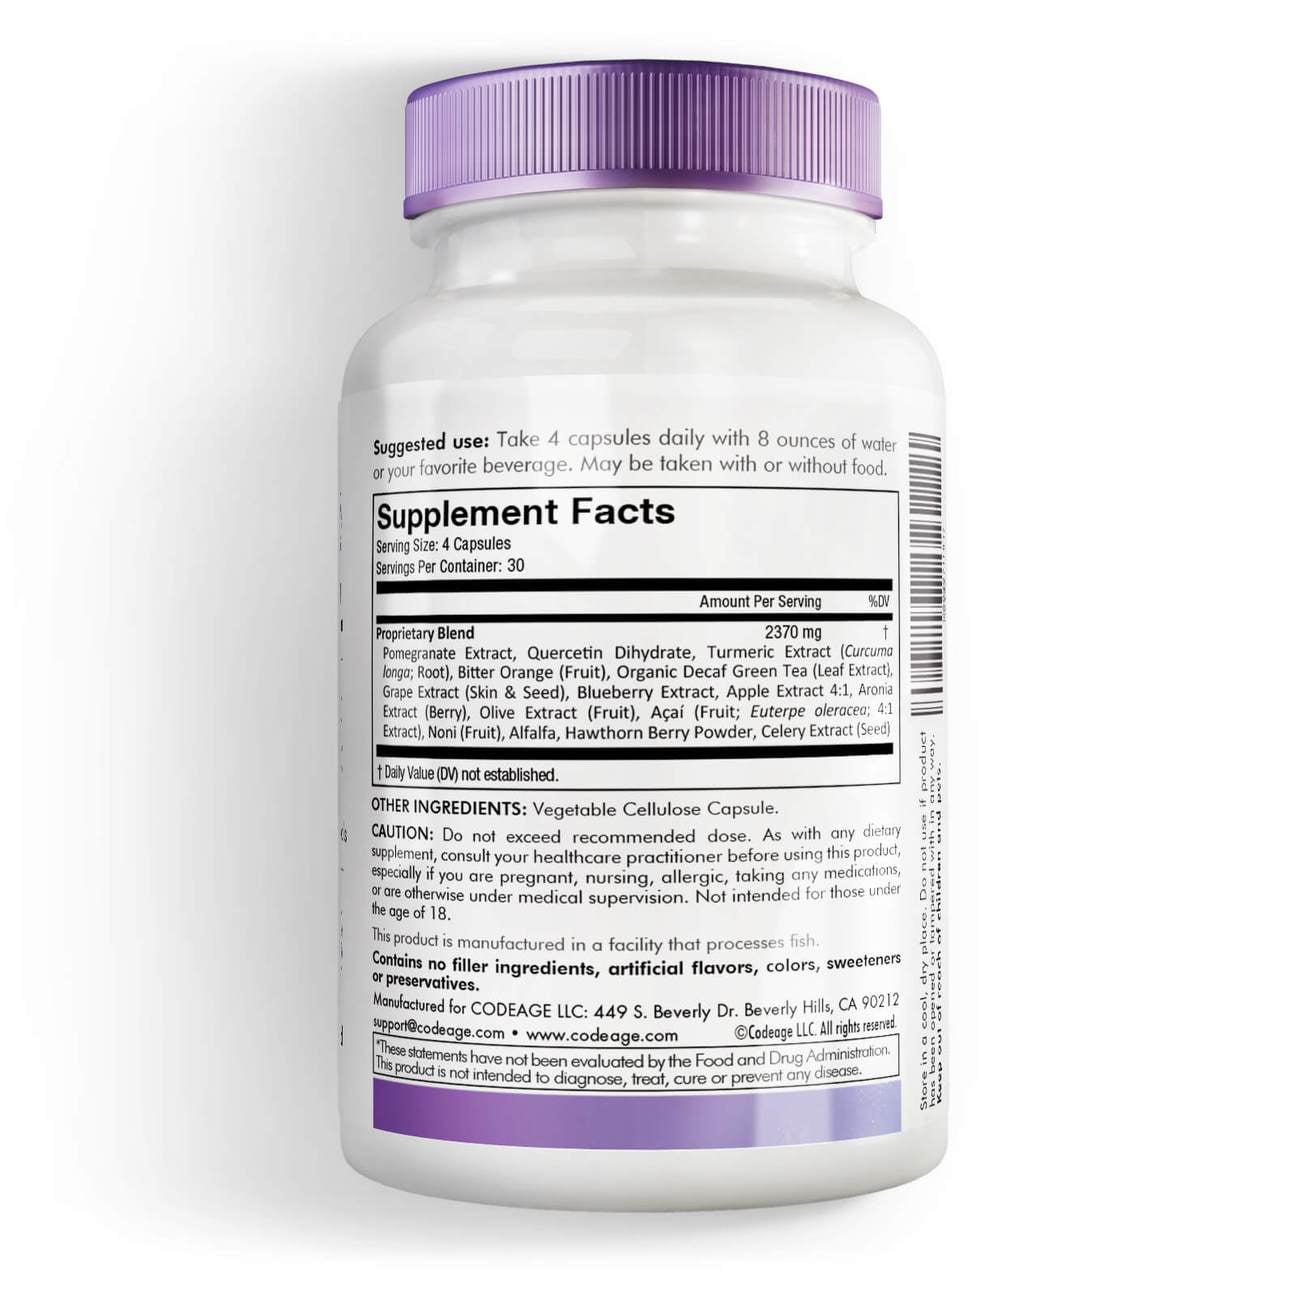 Codeage Polyphenols Supplement Organic Green Tea Pills